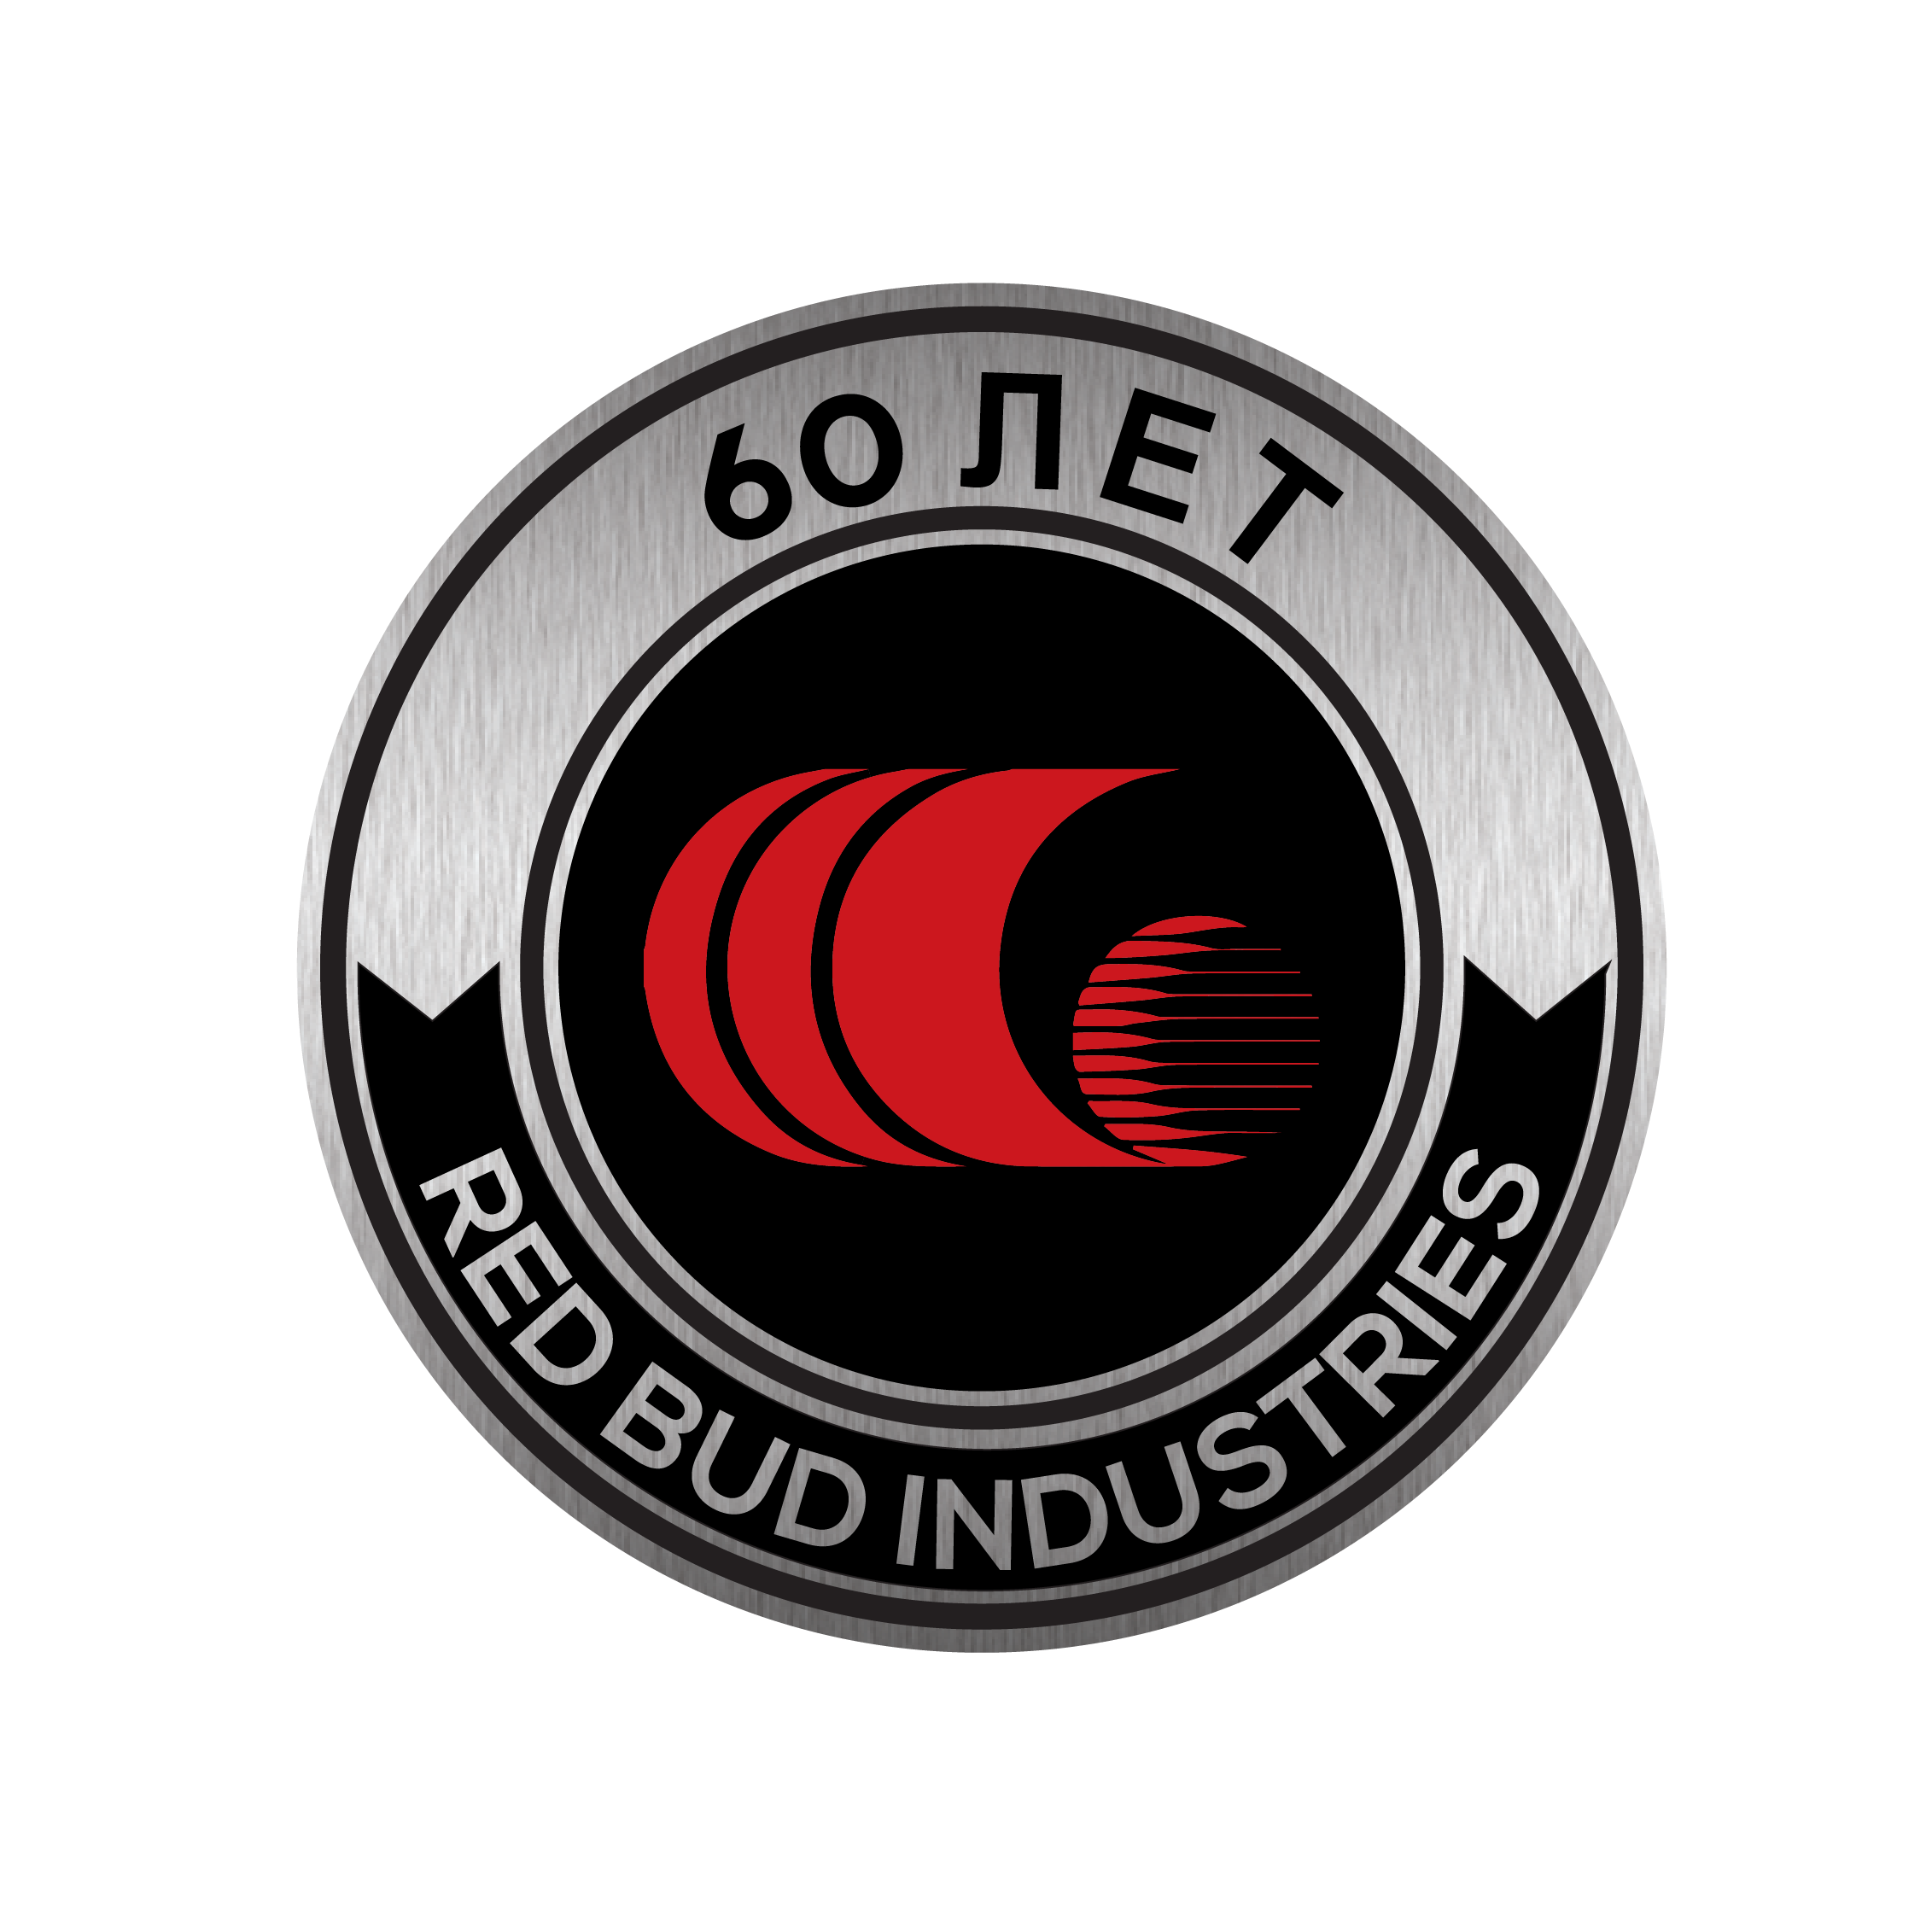 60th_Anniversary_Logo_Russian